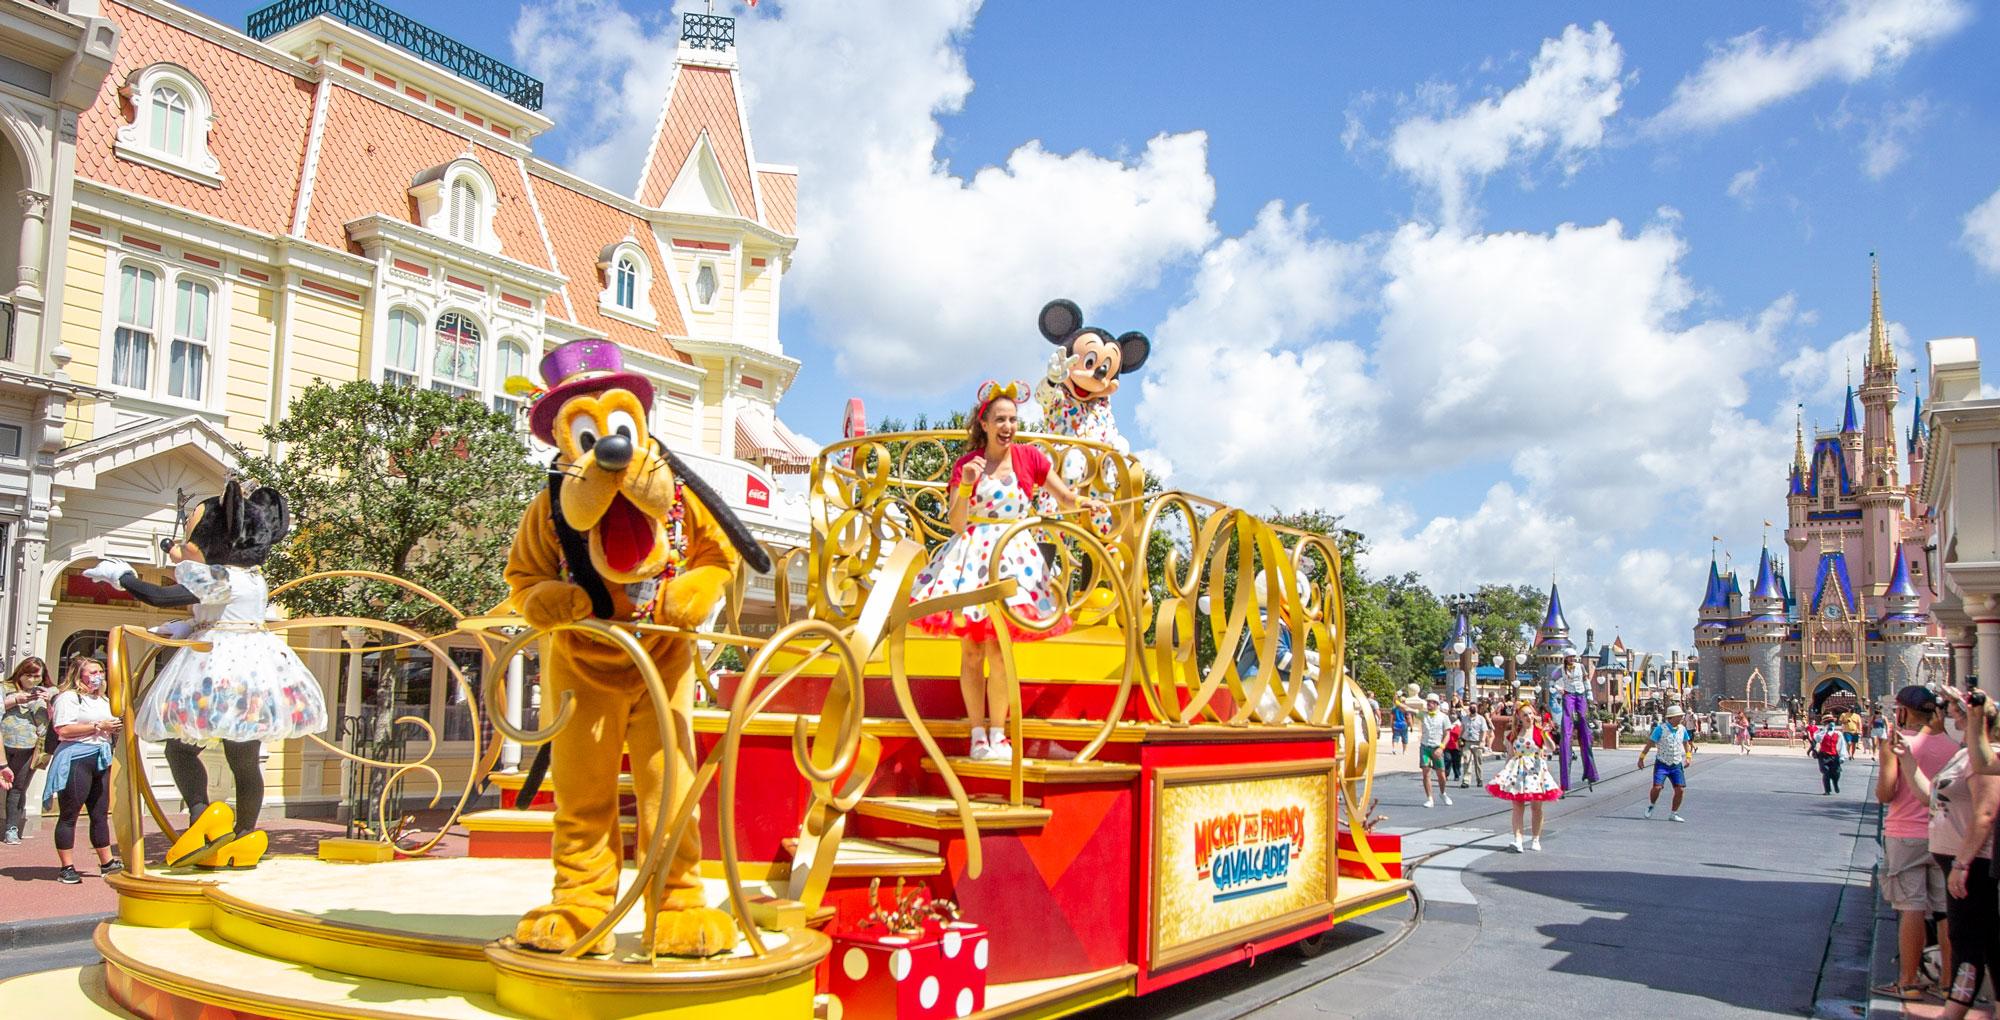 Mickey and Friends cavalcade at the Magic Kingdom.